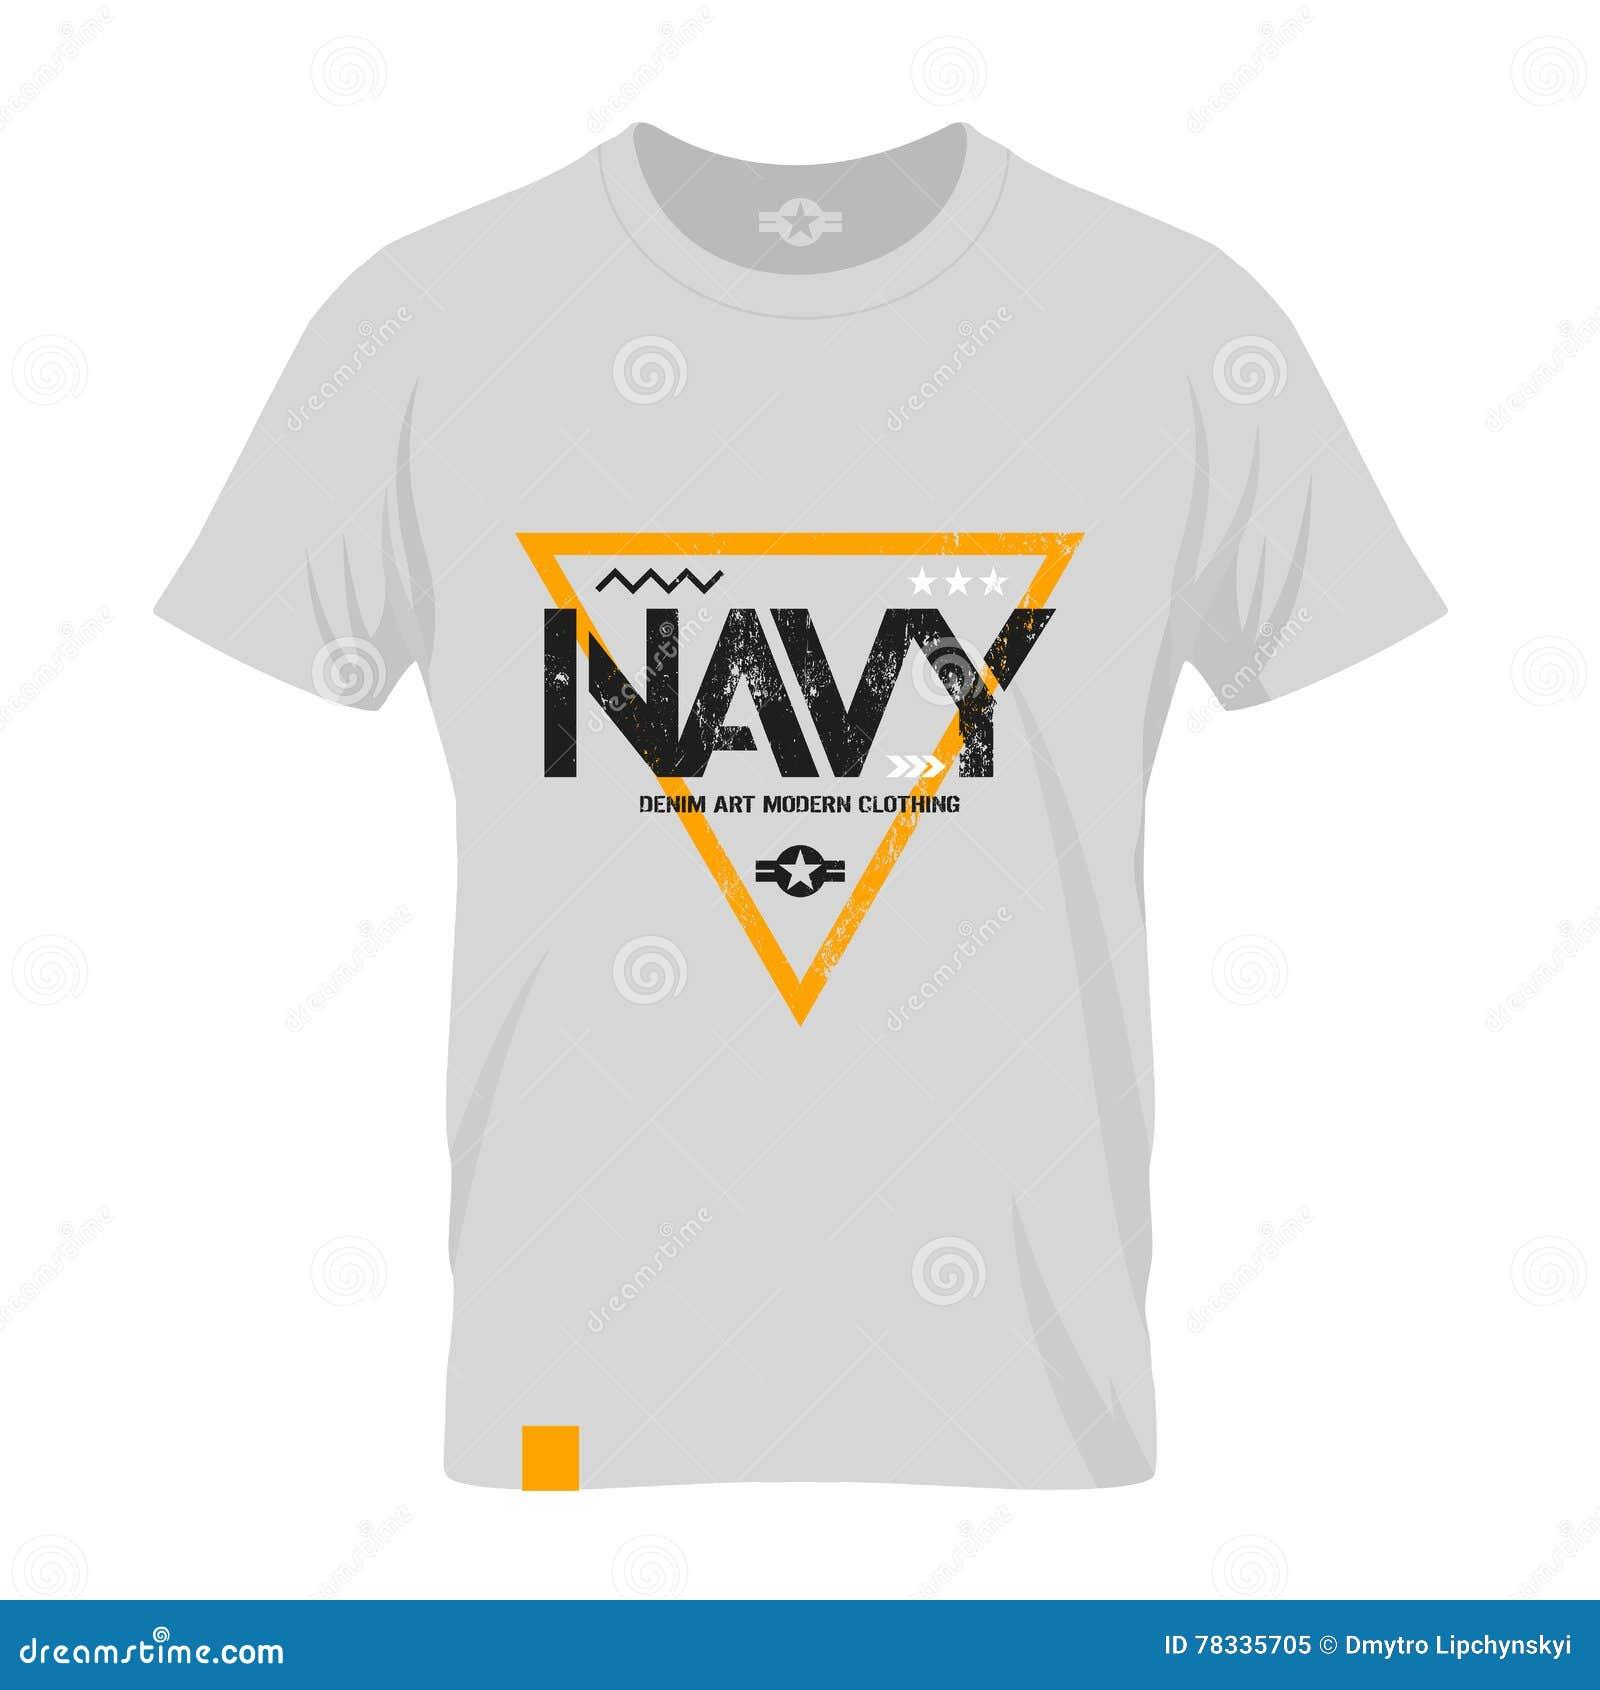 c8f779c9 Threadbare Warlike Label Light T-shirt Mock Up. Stock Vector ...